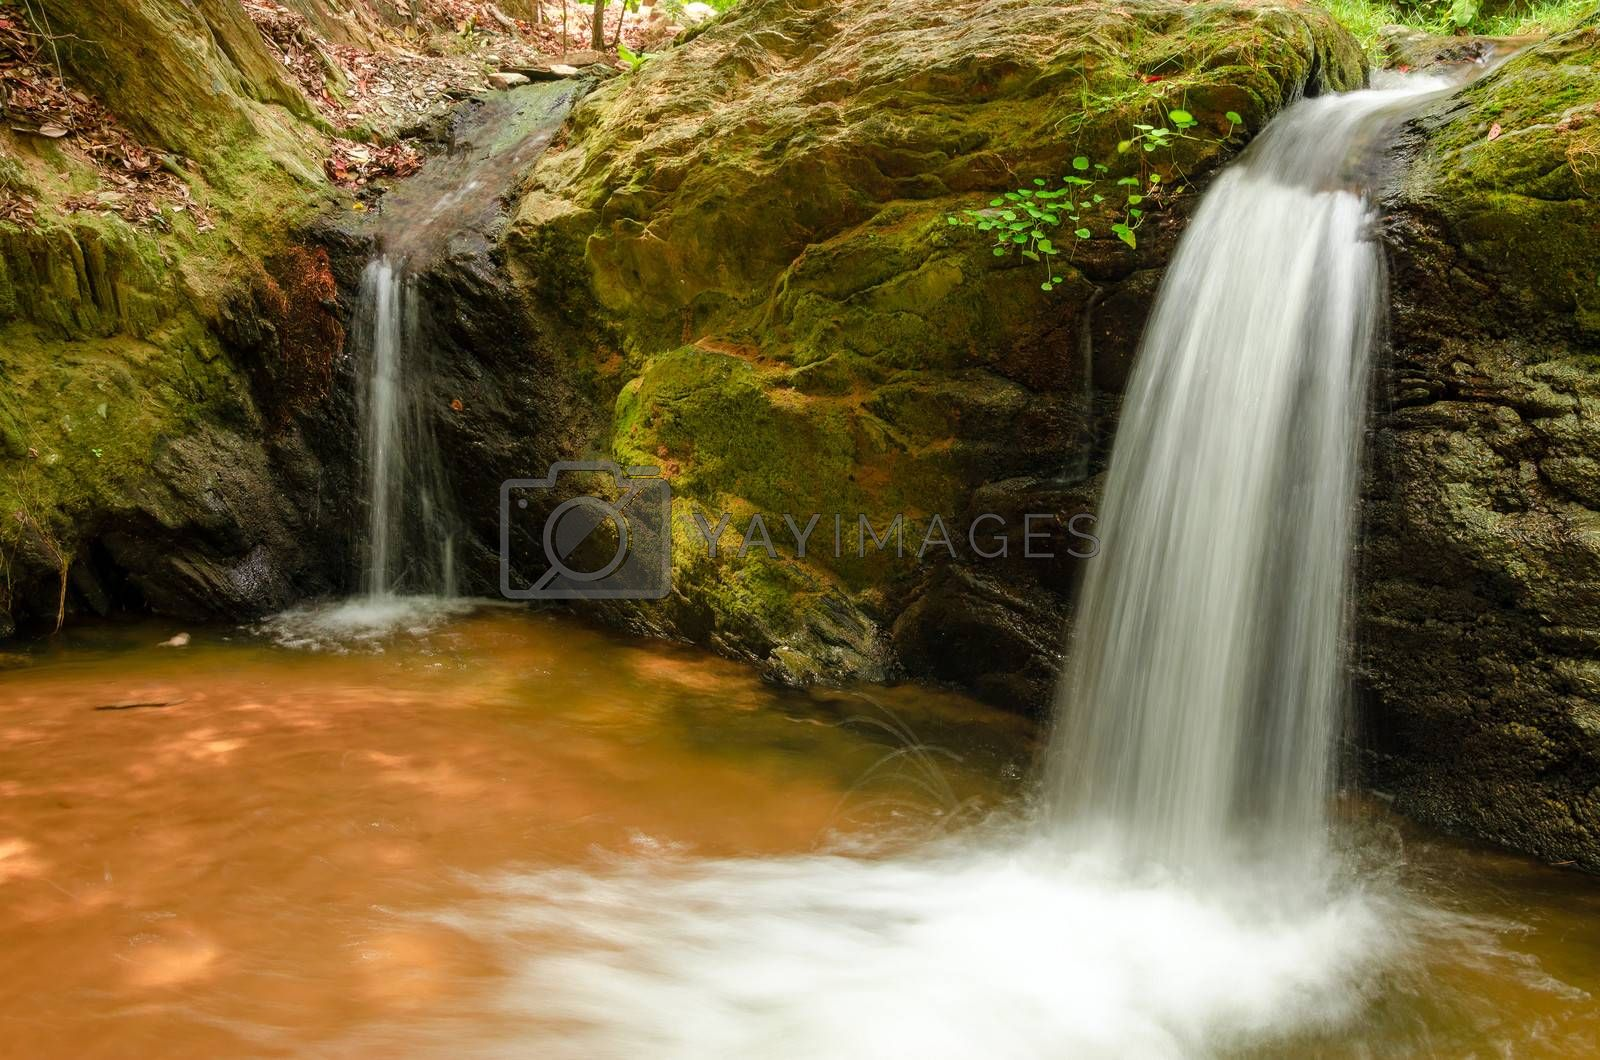 Two small waterfalls in La Guajira, Colombia